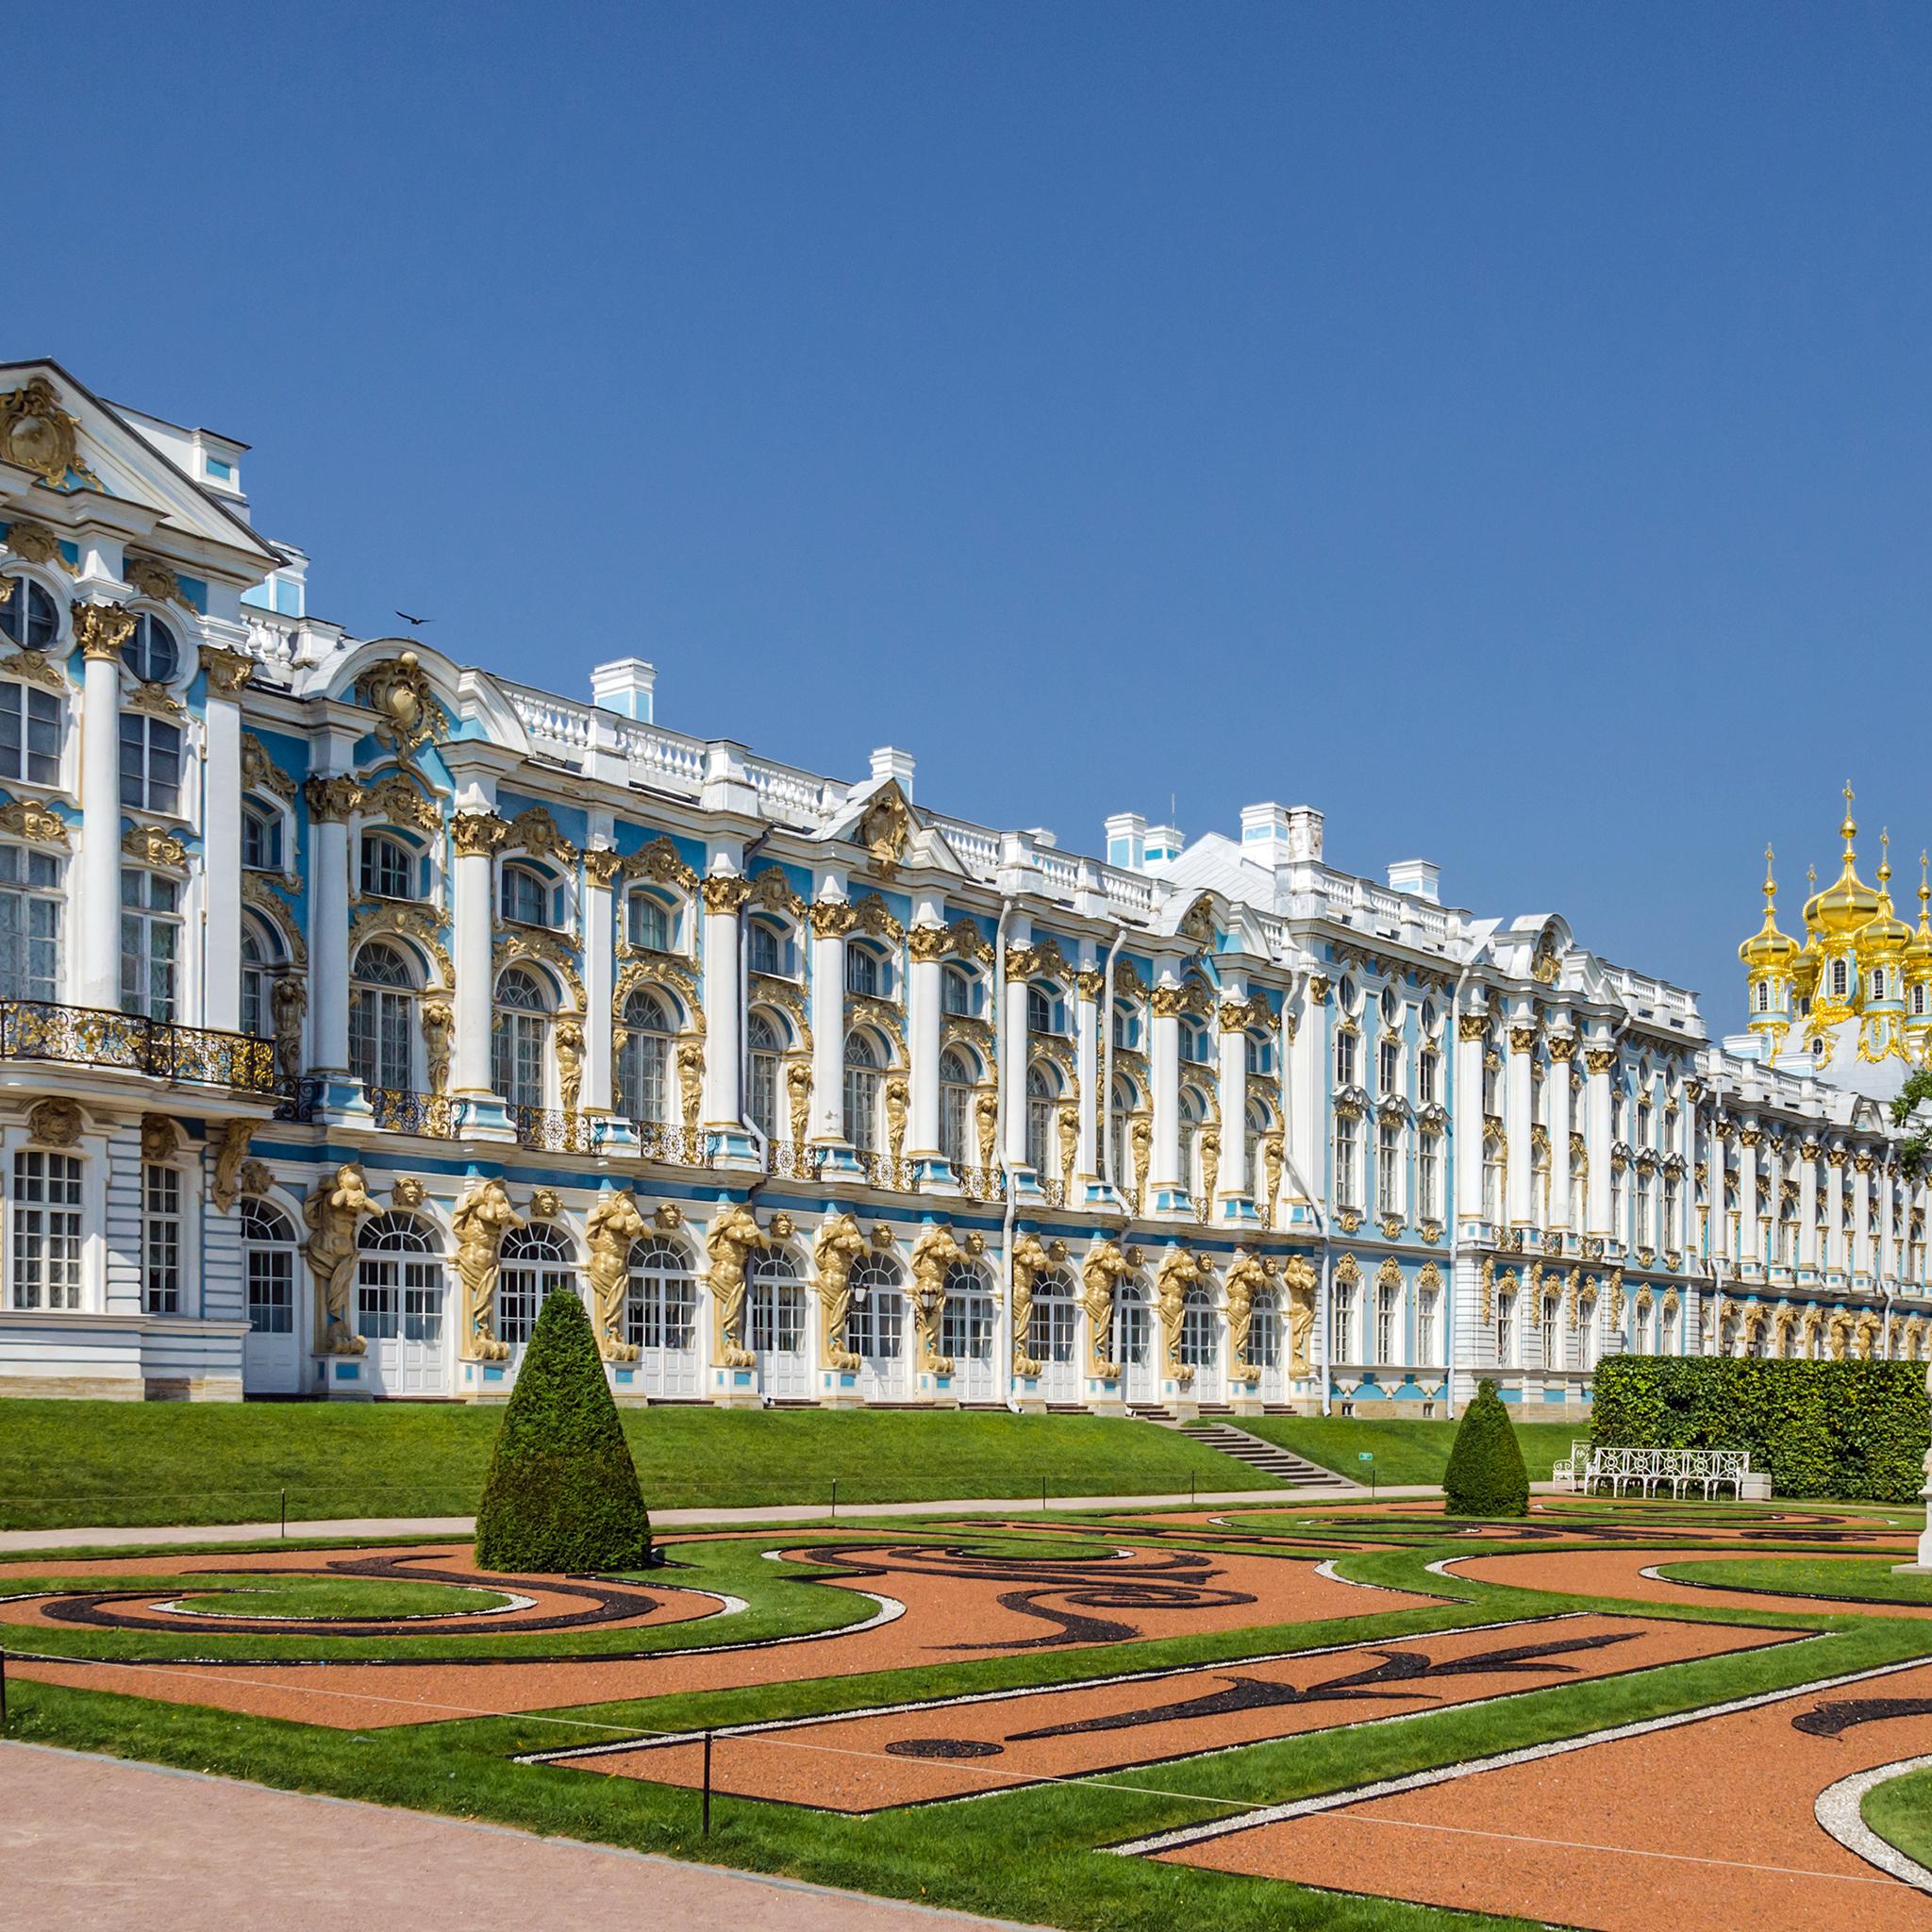 Catherine Palace in Tsarskoe Selo 3Wallpapers iPad Retina Catherine Palace in Tsarskoe Selo   iPad Retina